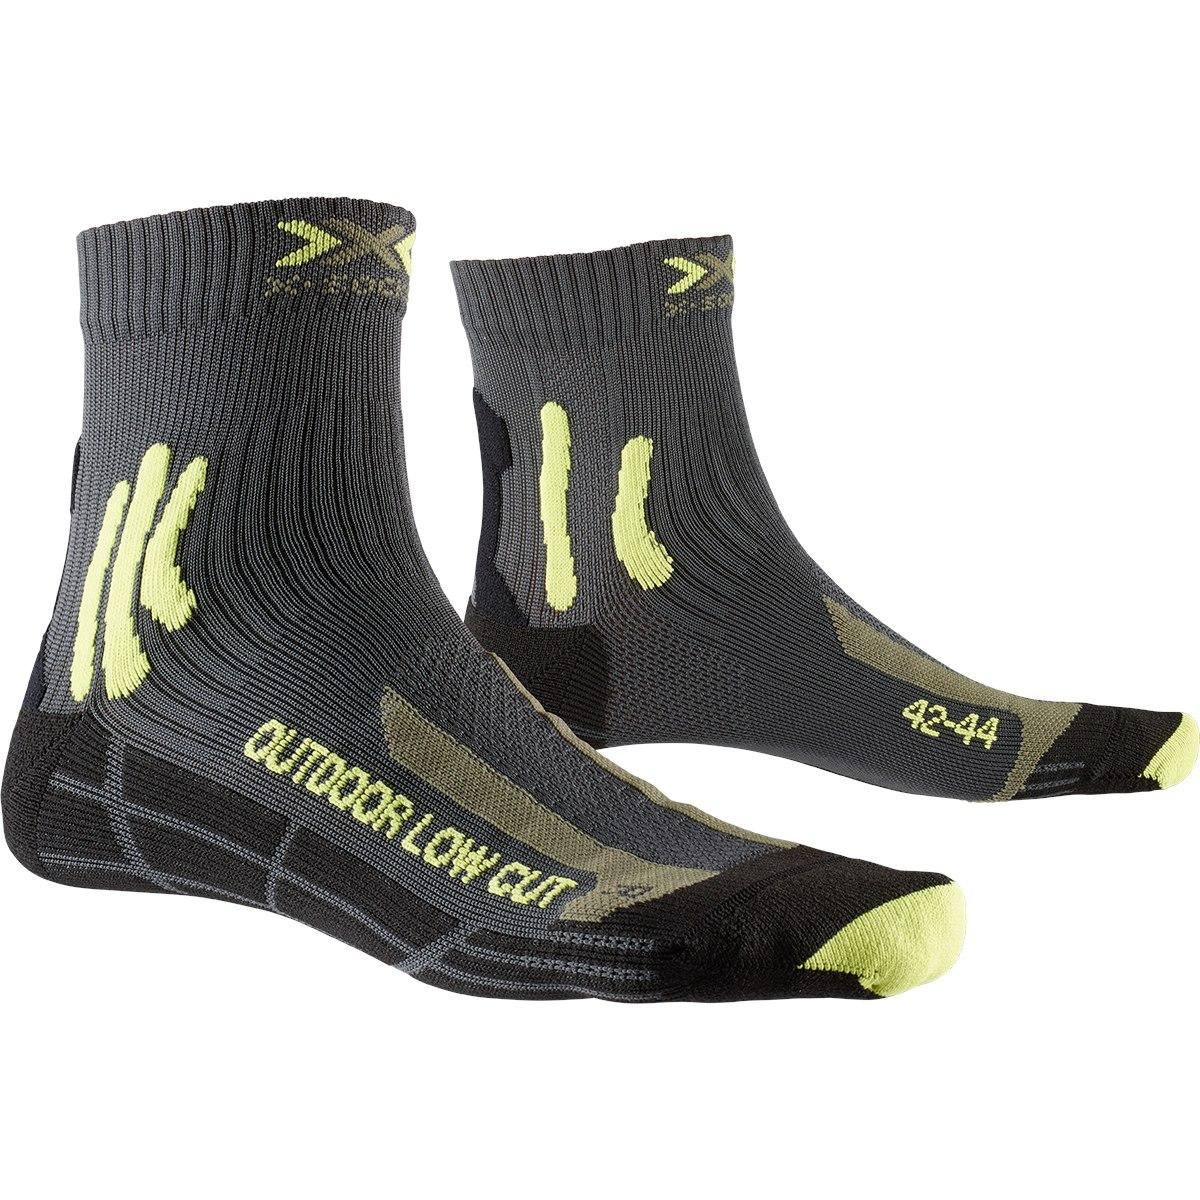 X-Socks Trek Outdoor Low Cut Socken - anthracite/lime